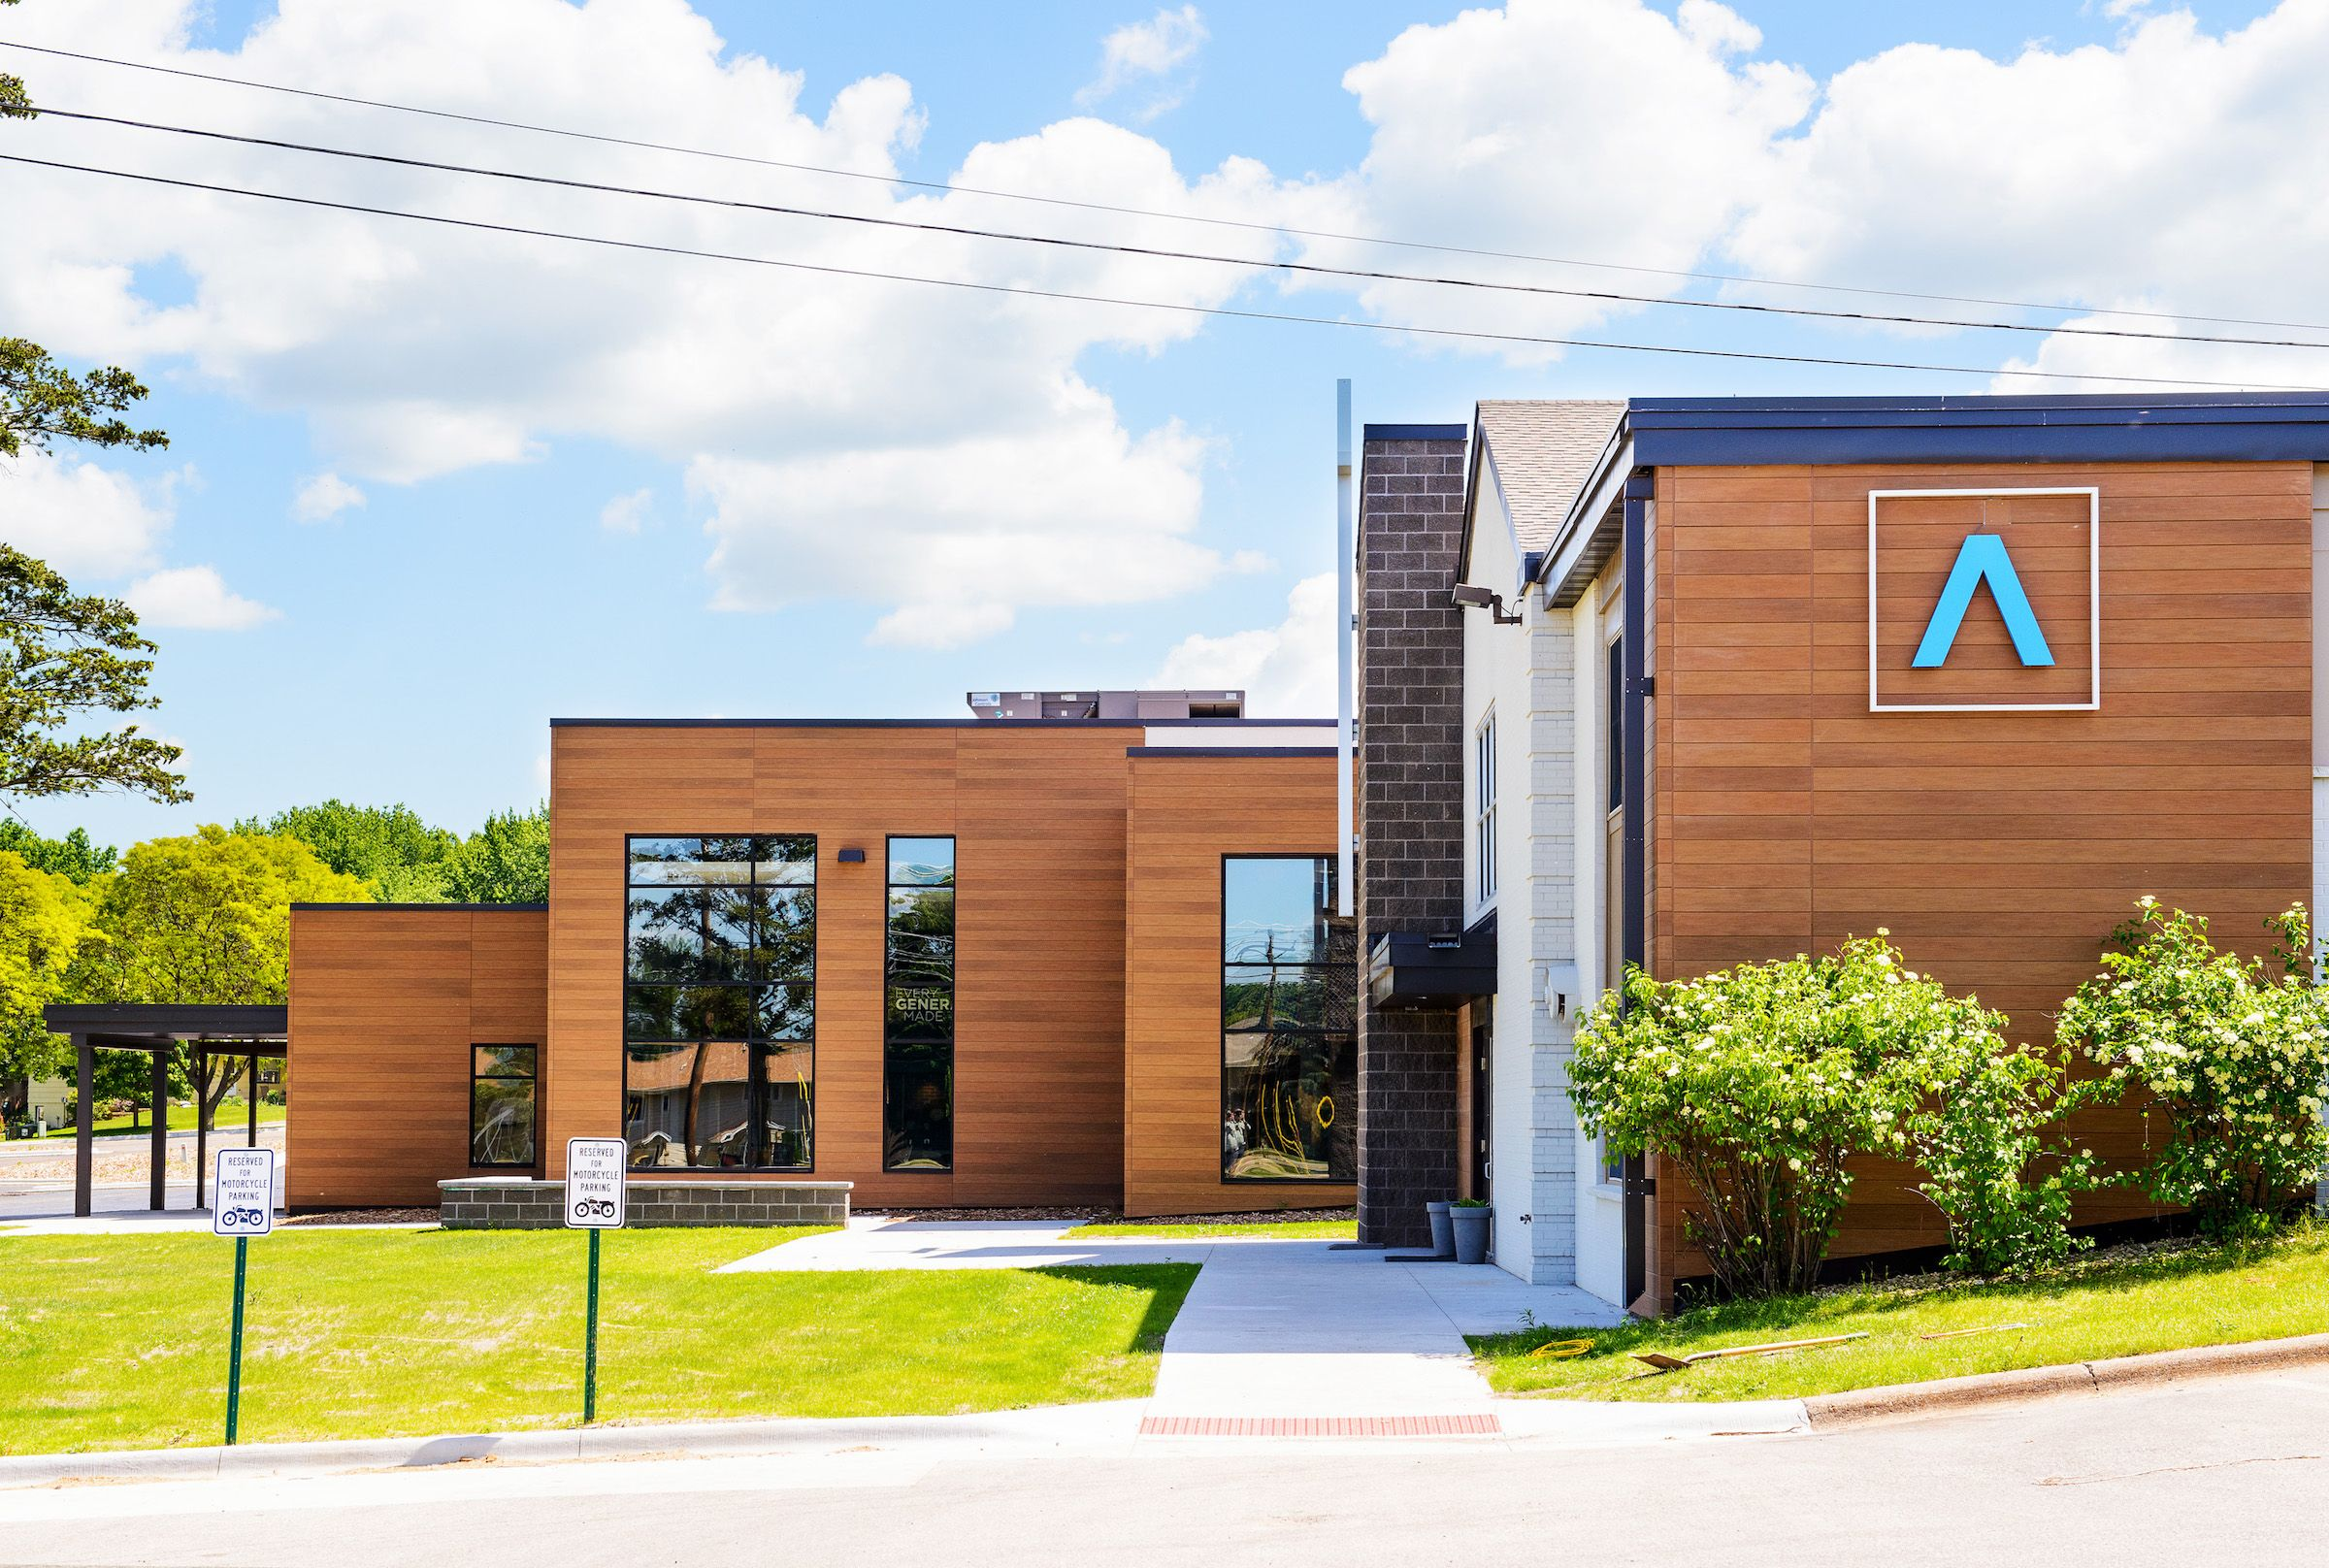 Benike Construction Fitness Center Design Stunning Exterior Of The Dan Abraham Healthy Commercial Design Exterior Fitness Center Design Commercial Design